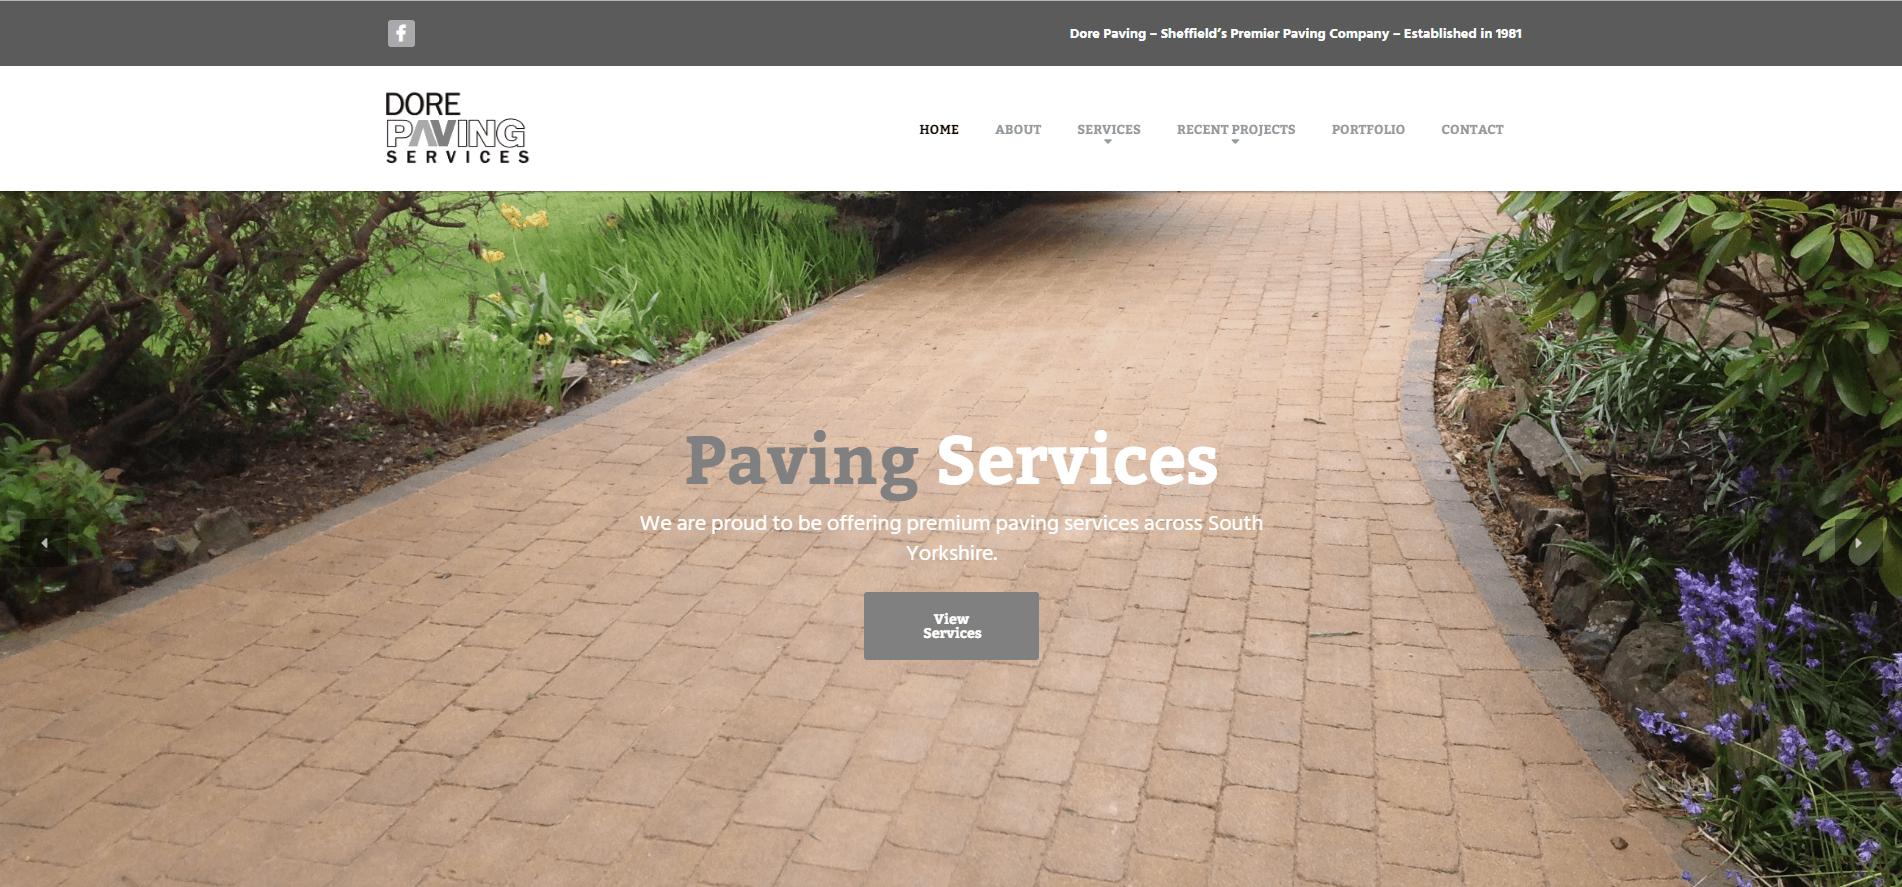 Dore Paving Services